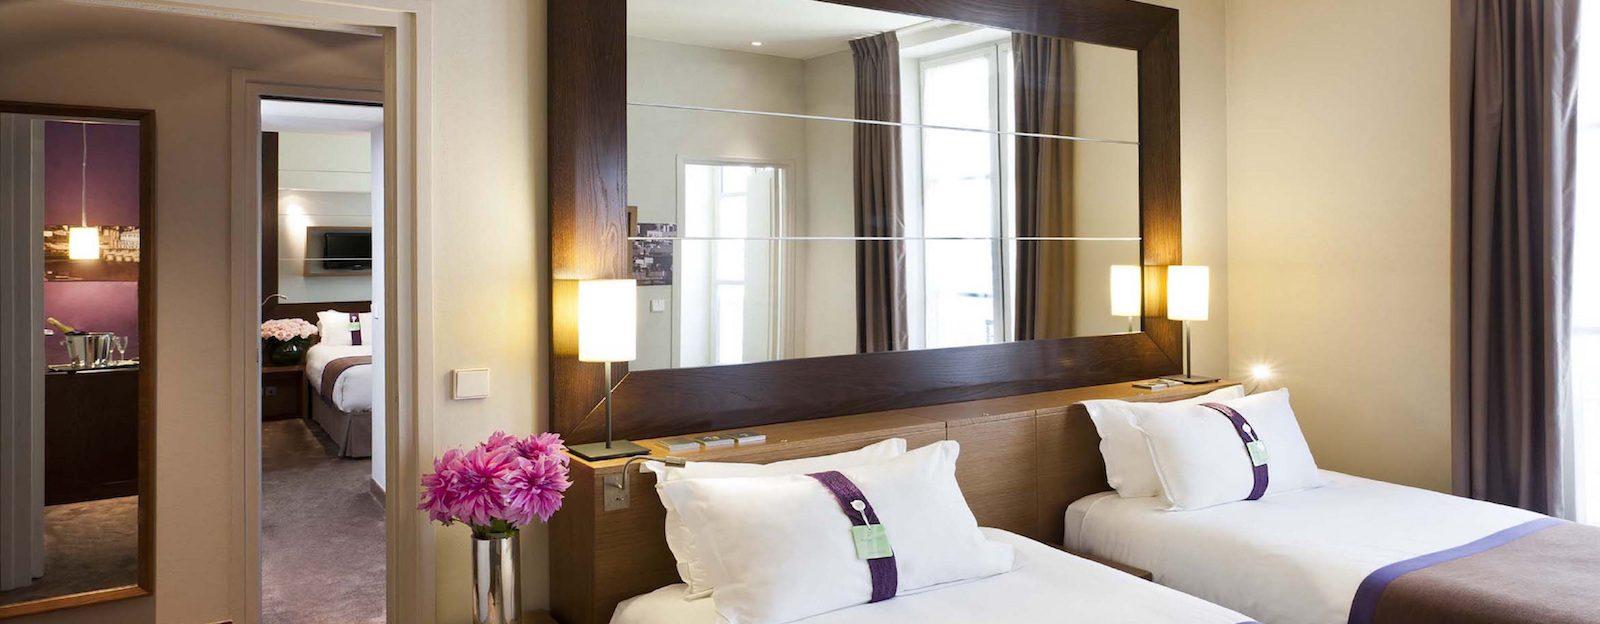 holiday inn paris elys es poussin voyageur. Black Bedroom Furniture Sets. Home Design Ideas